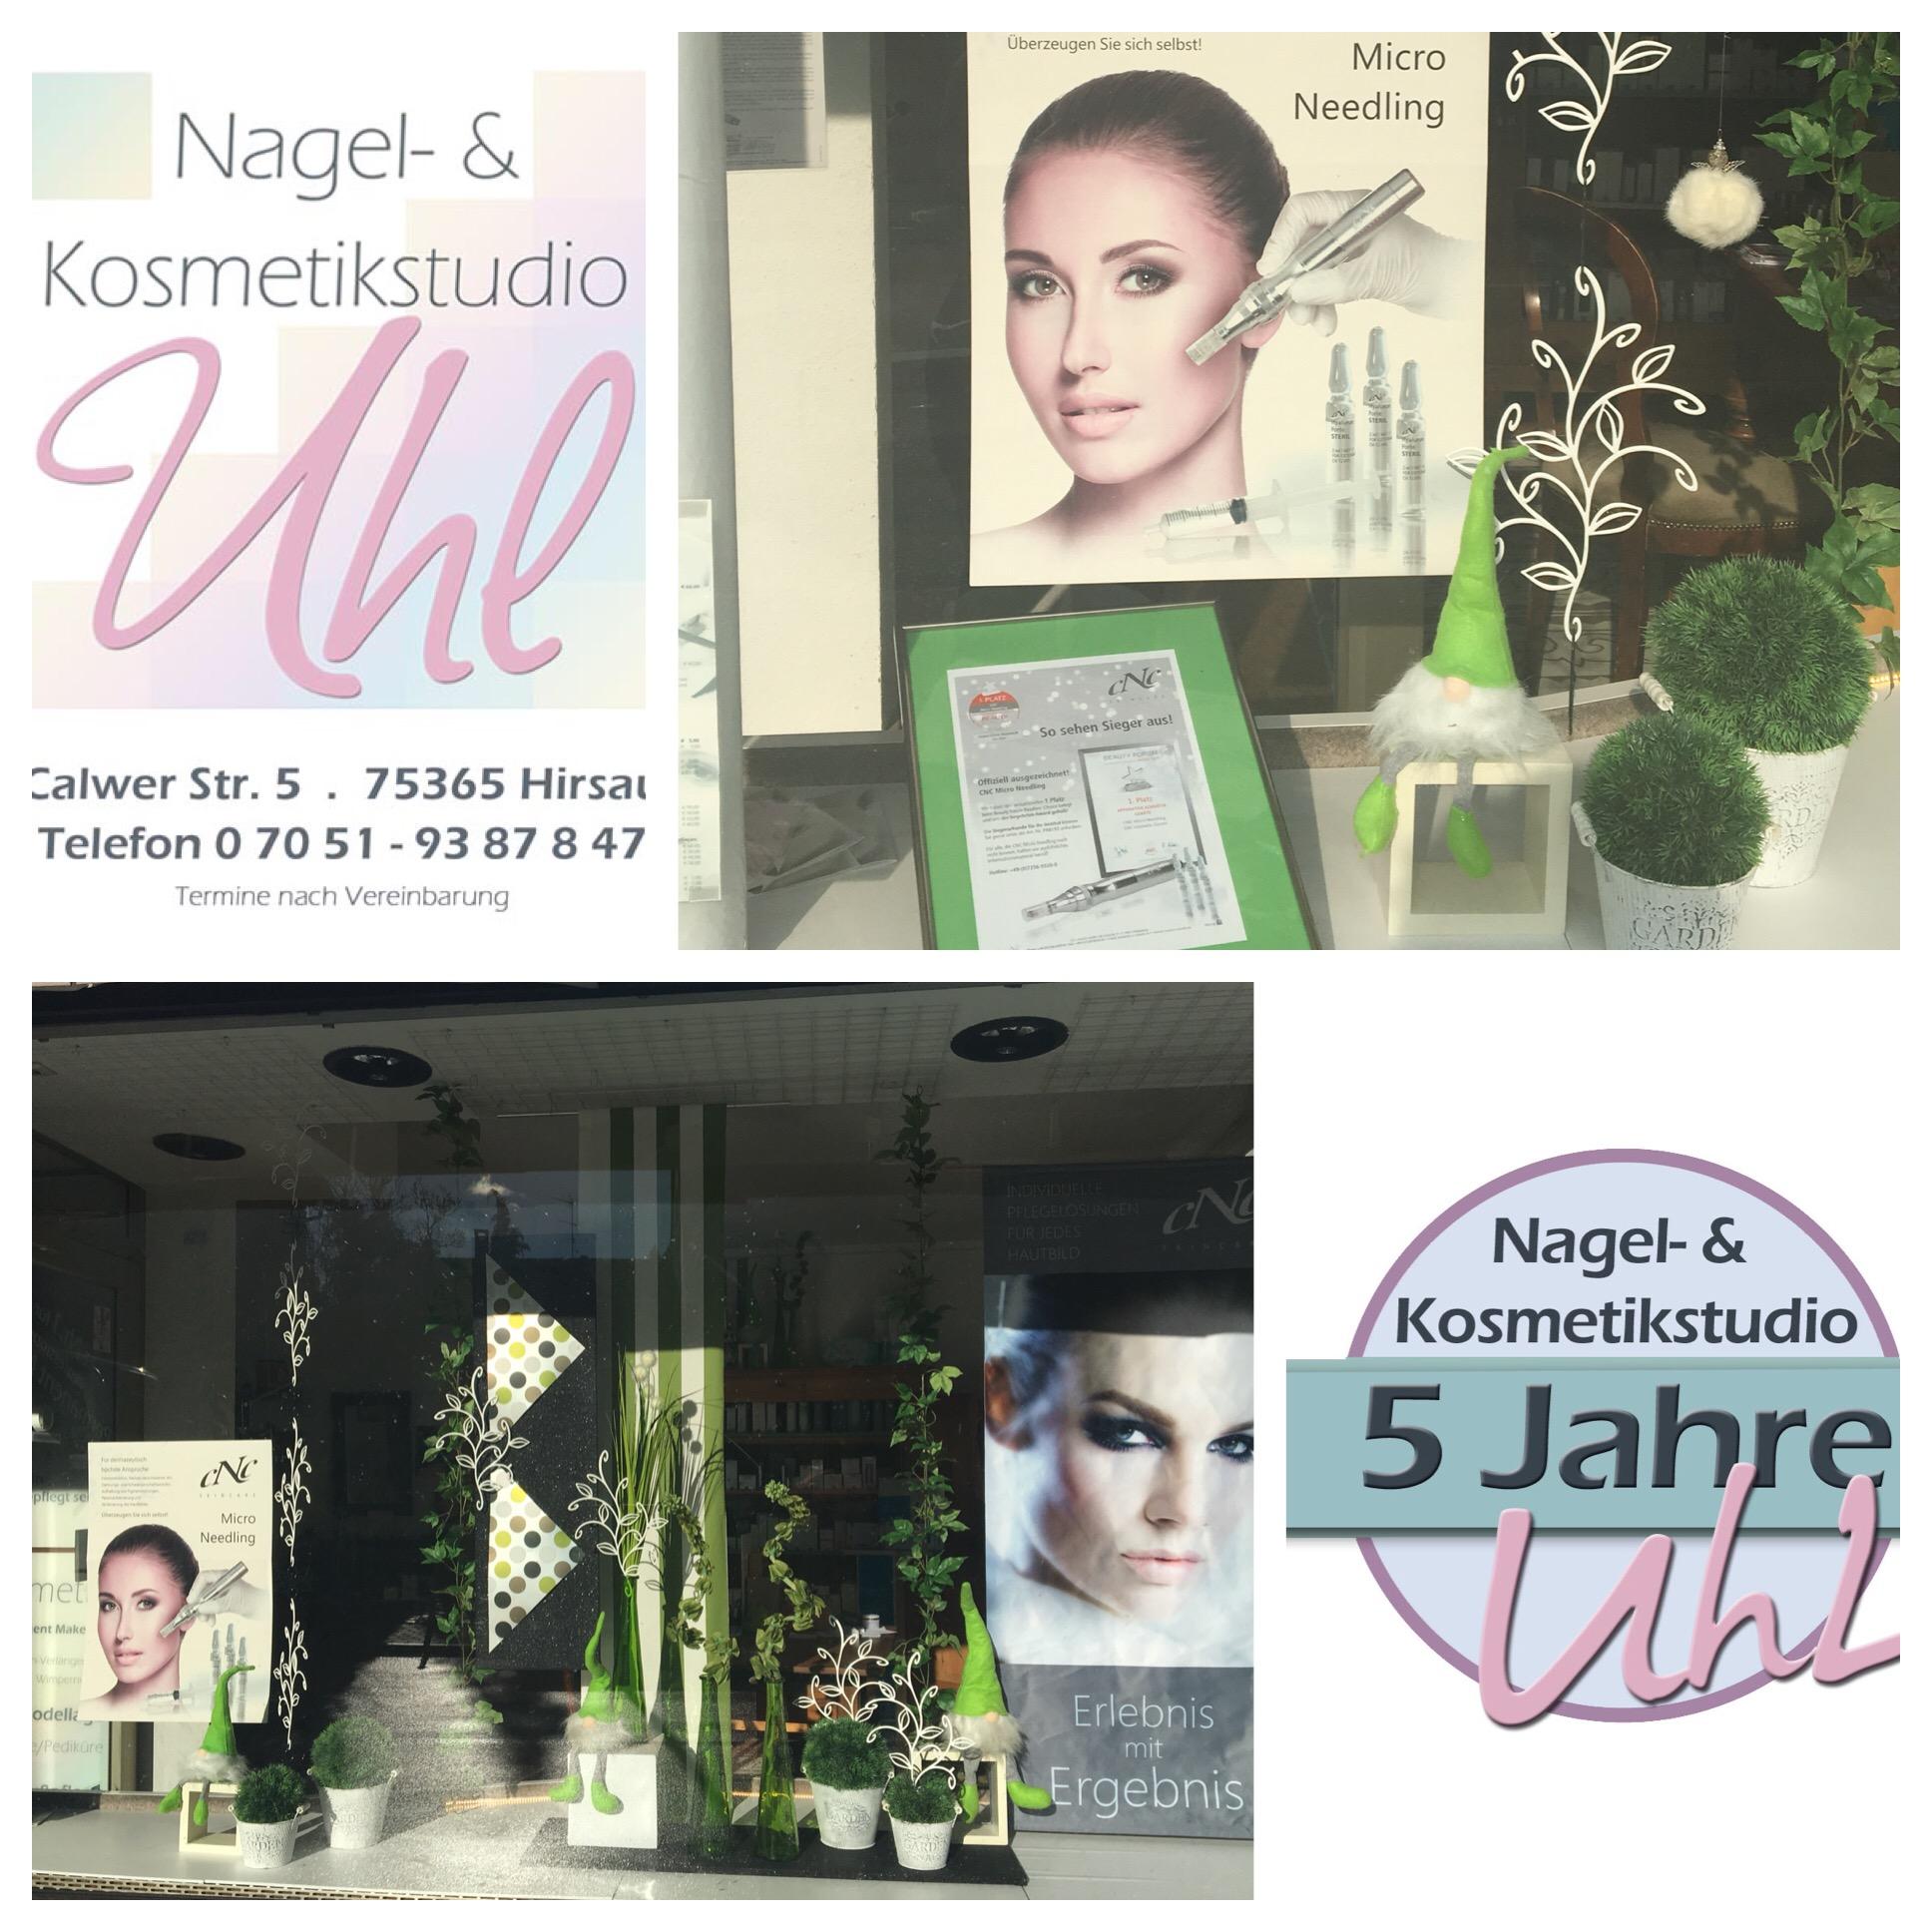 Nagel-& Kosmetikstudio UHL